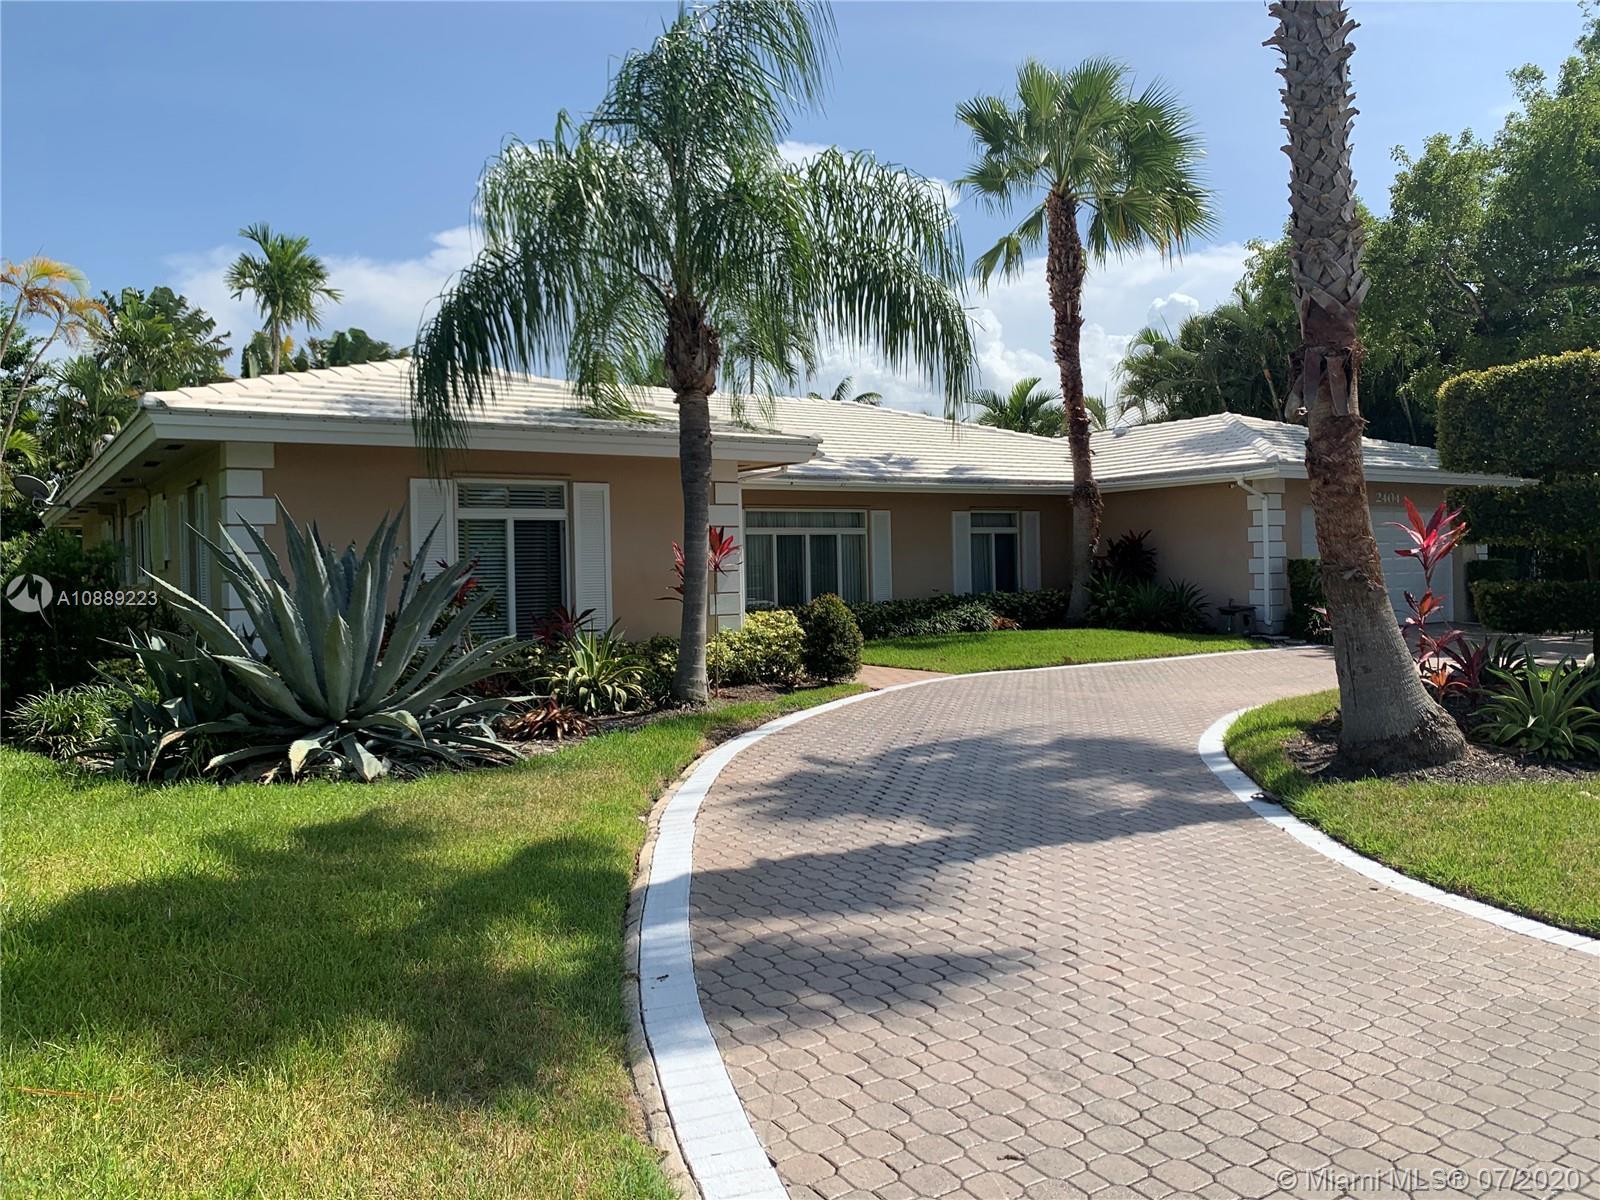 2404 NE 37th Dr Property Photo - Fort Lauderdale, FL real estate listing